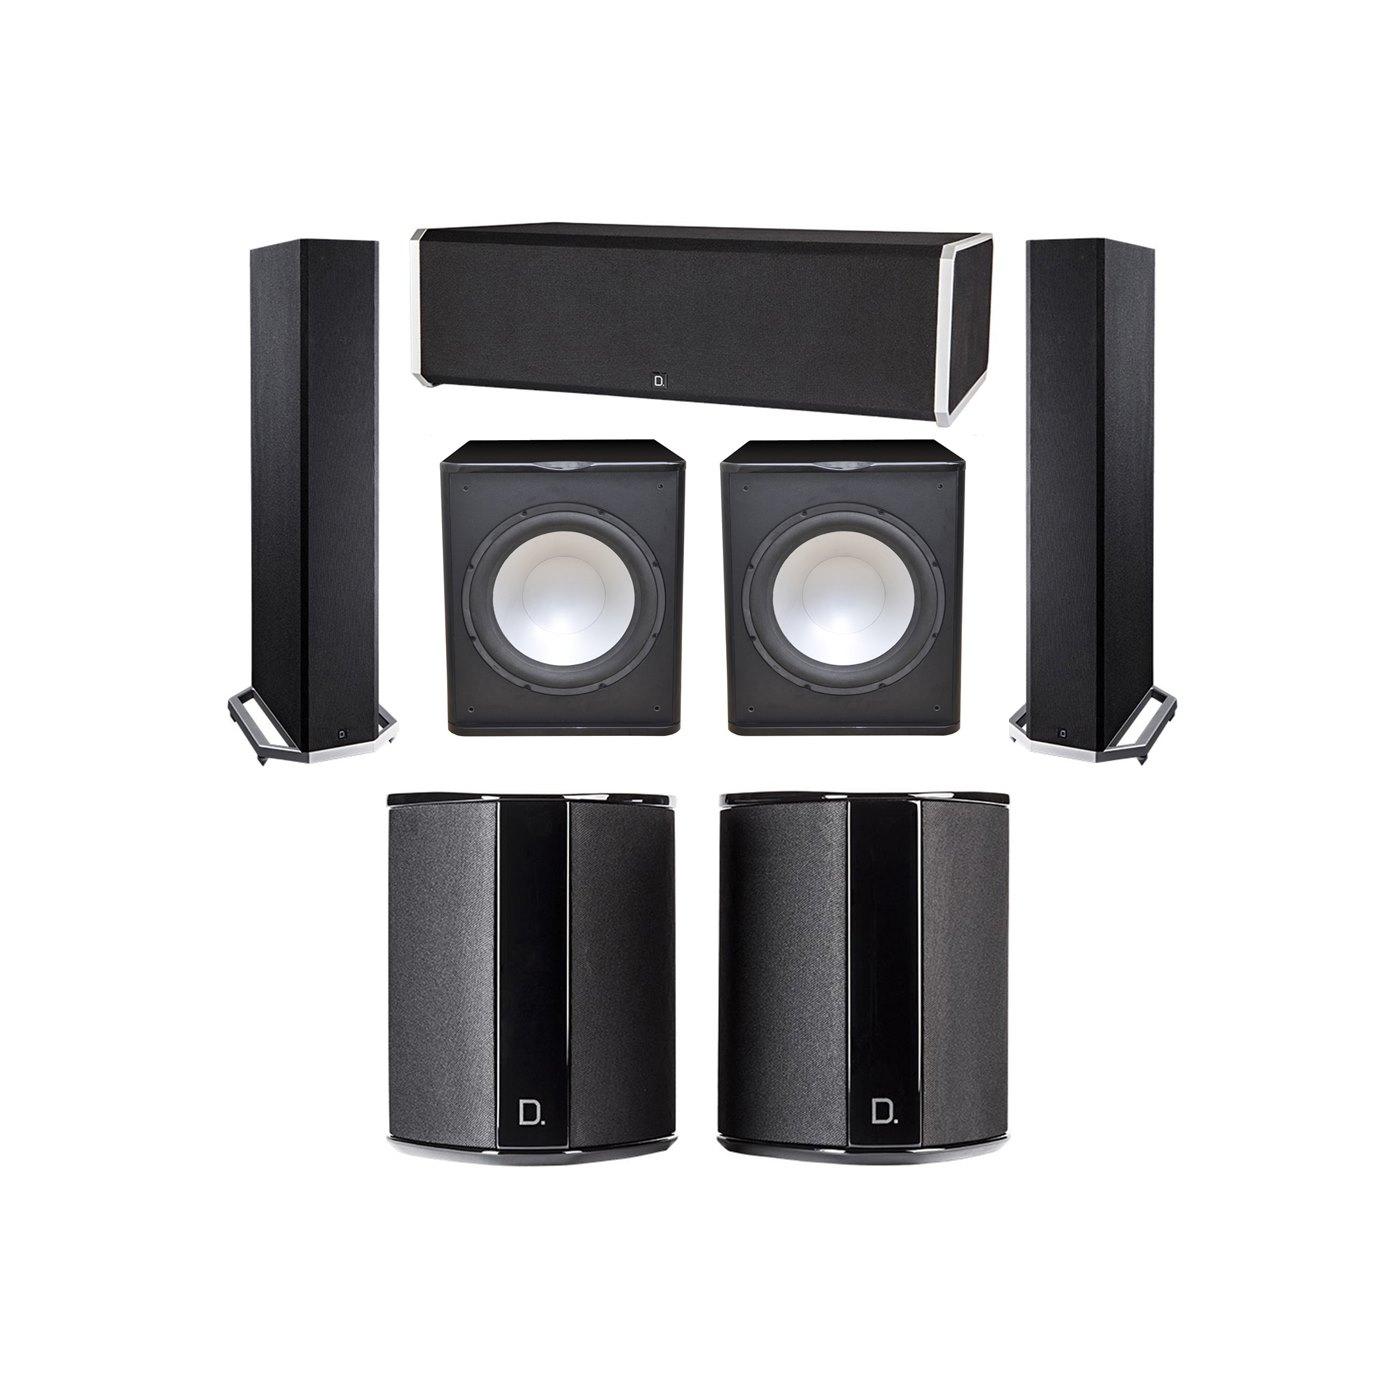 Definitive Technology 5.2 System with 2 BP9020 Tower Speakers, 1 CS9080 Center Channel Speaker, 2 SR9040 Surround Speaker, 2 Premier Acoustic PA-150 Subwoofer